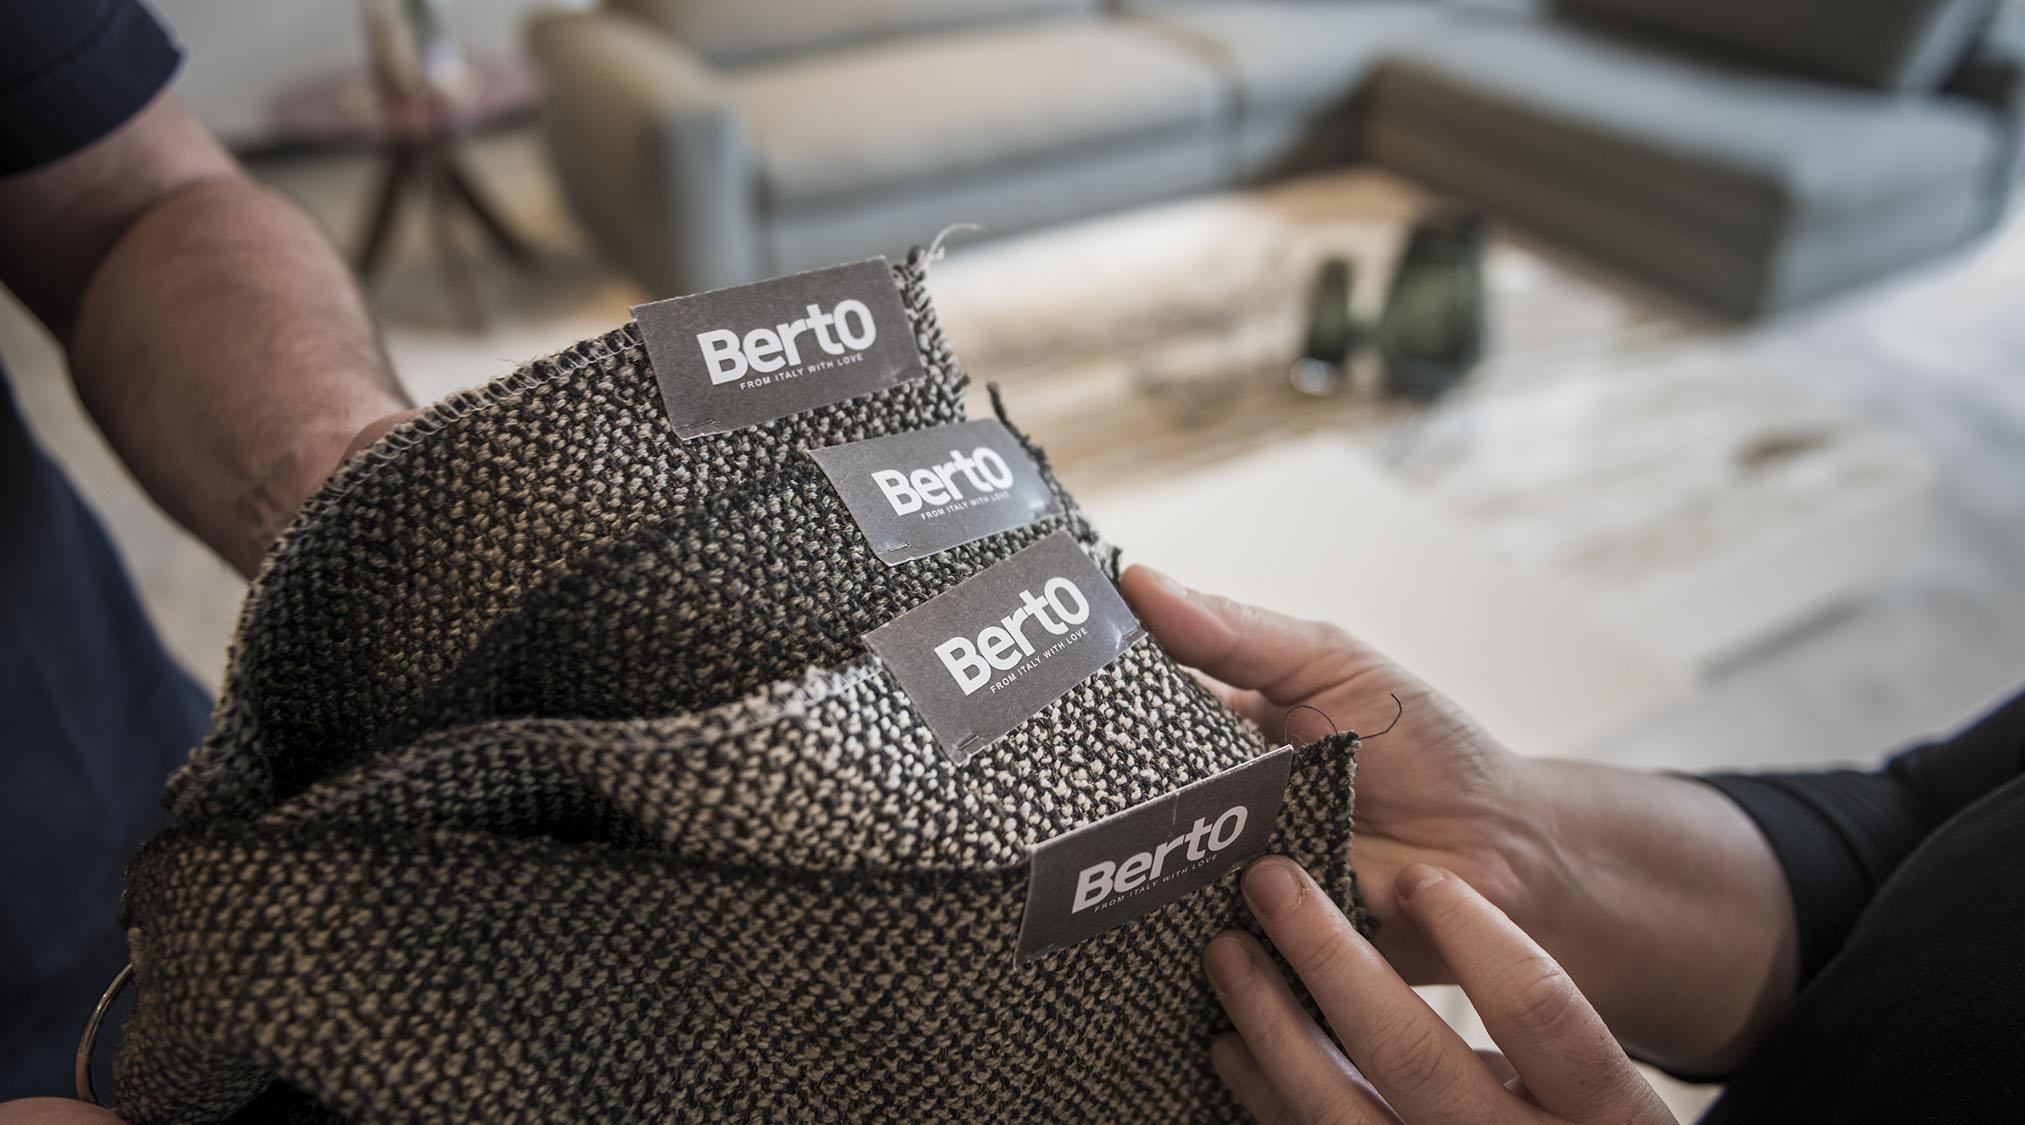 Berto Salotti罗马展纺织品系列